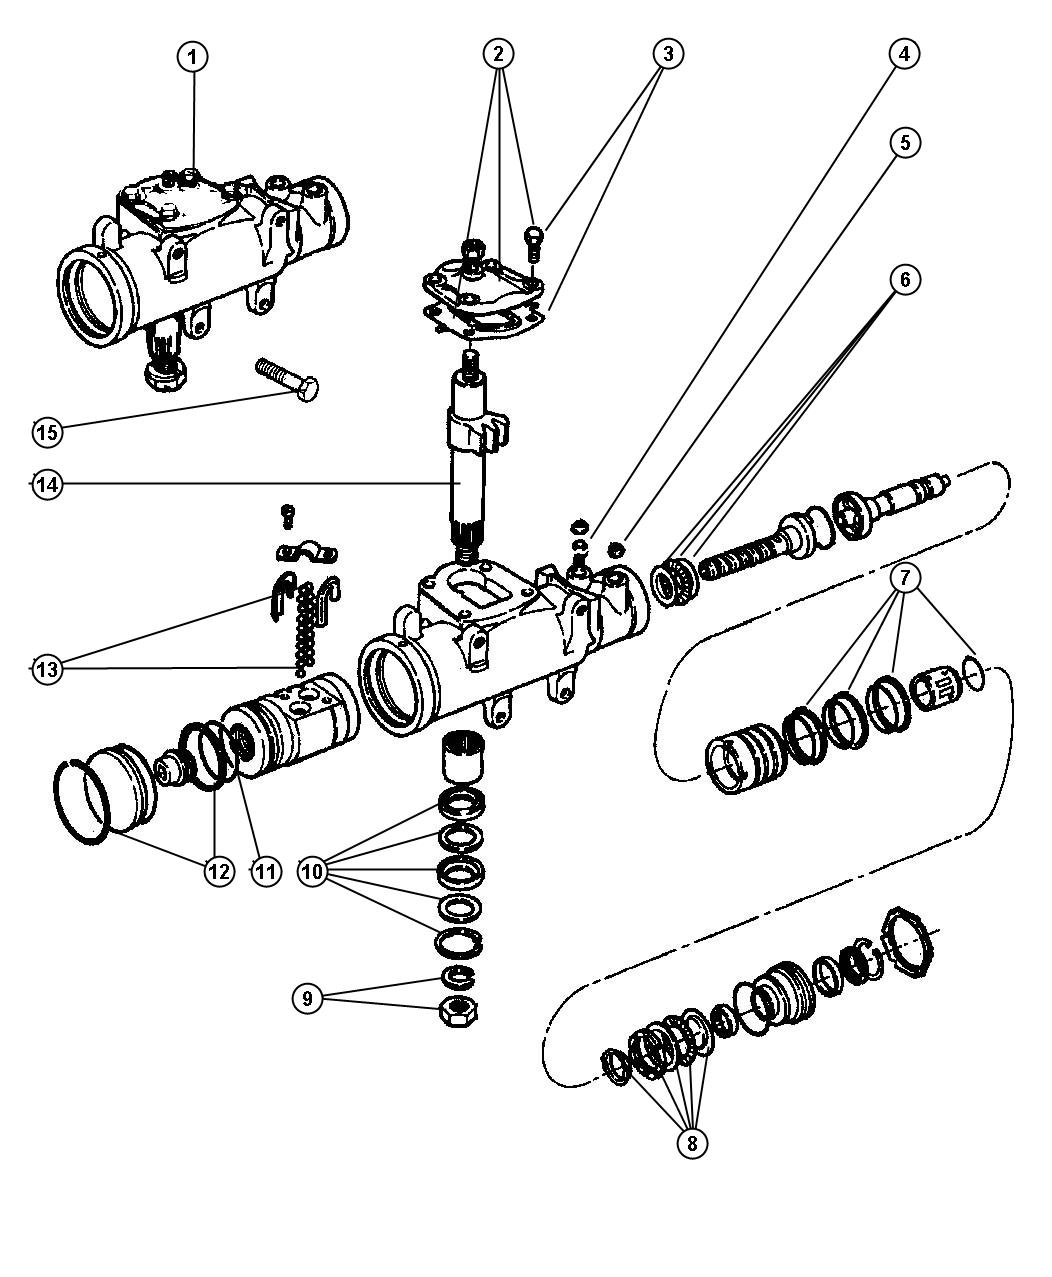 Dodge Ram Gear Power Steering Gvw Rating